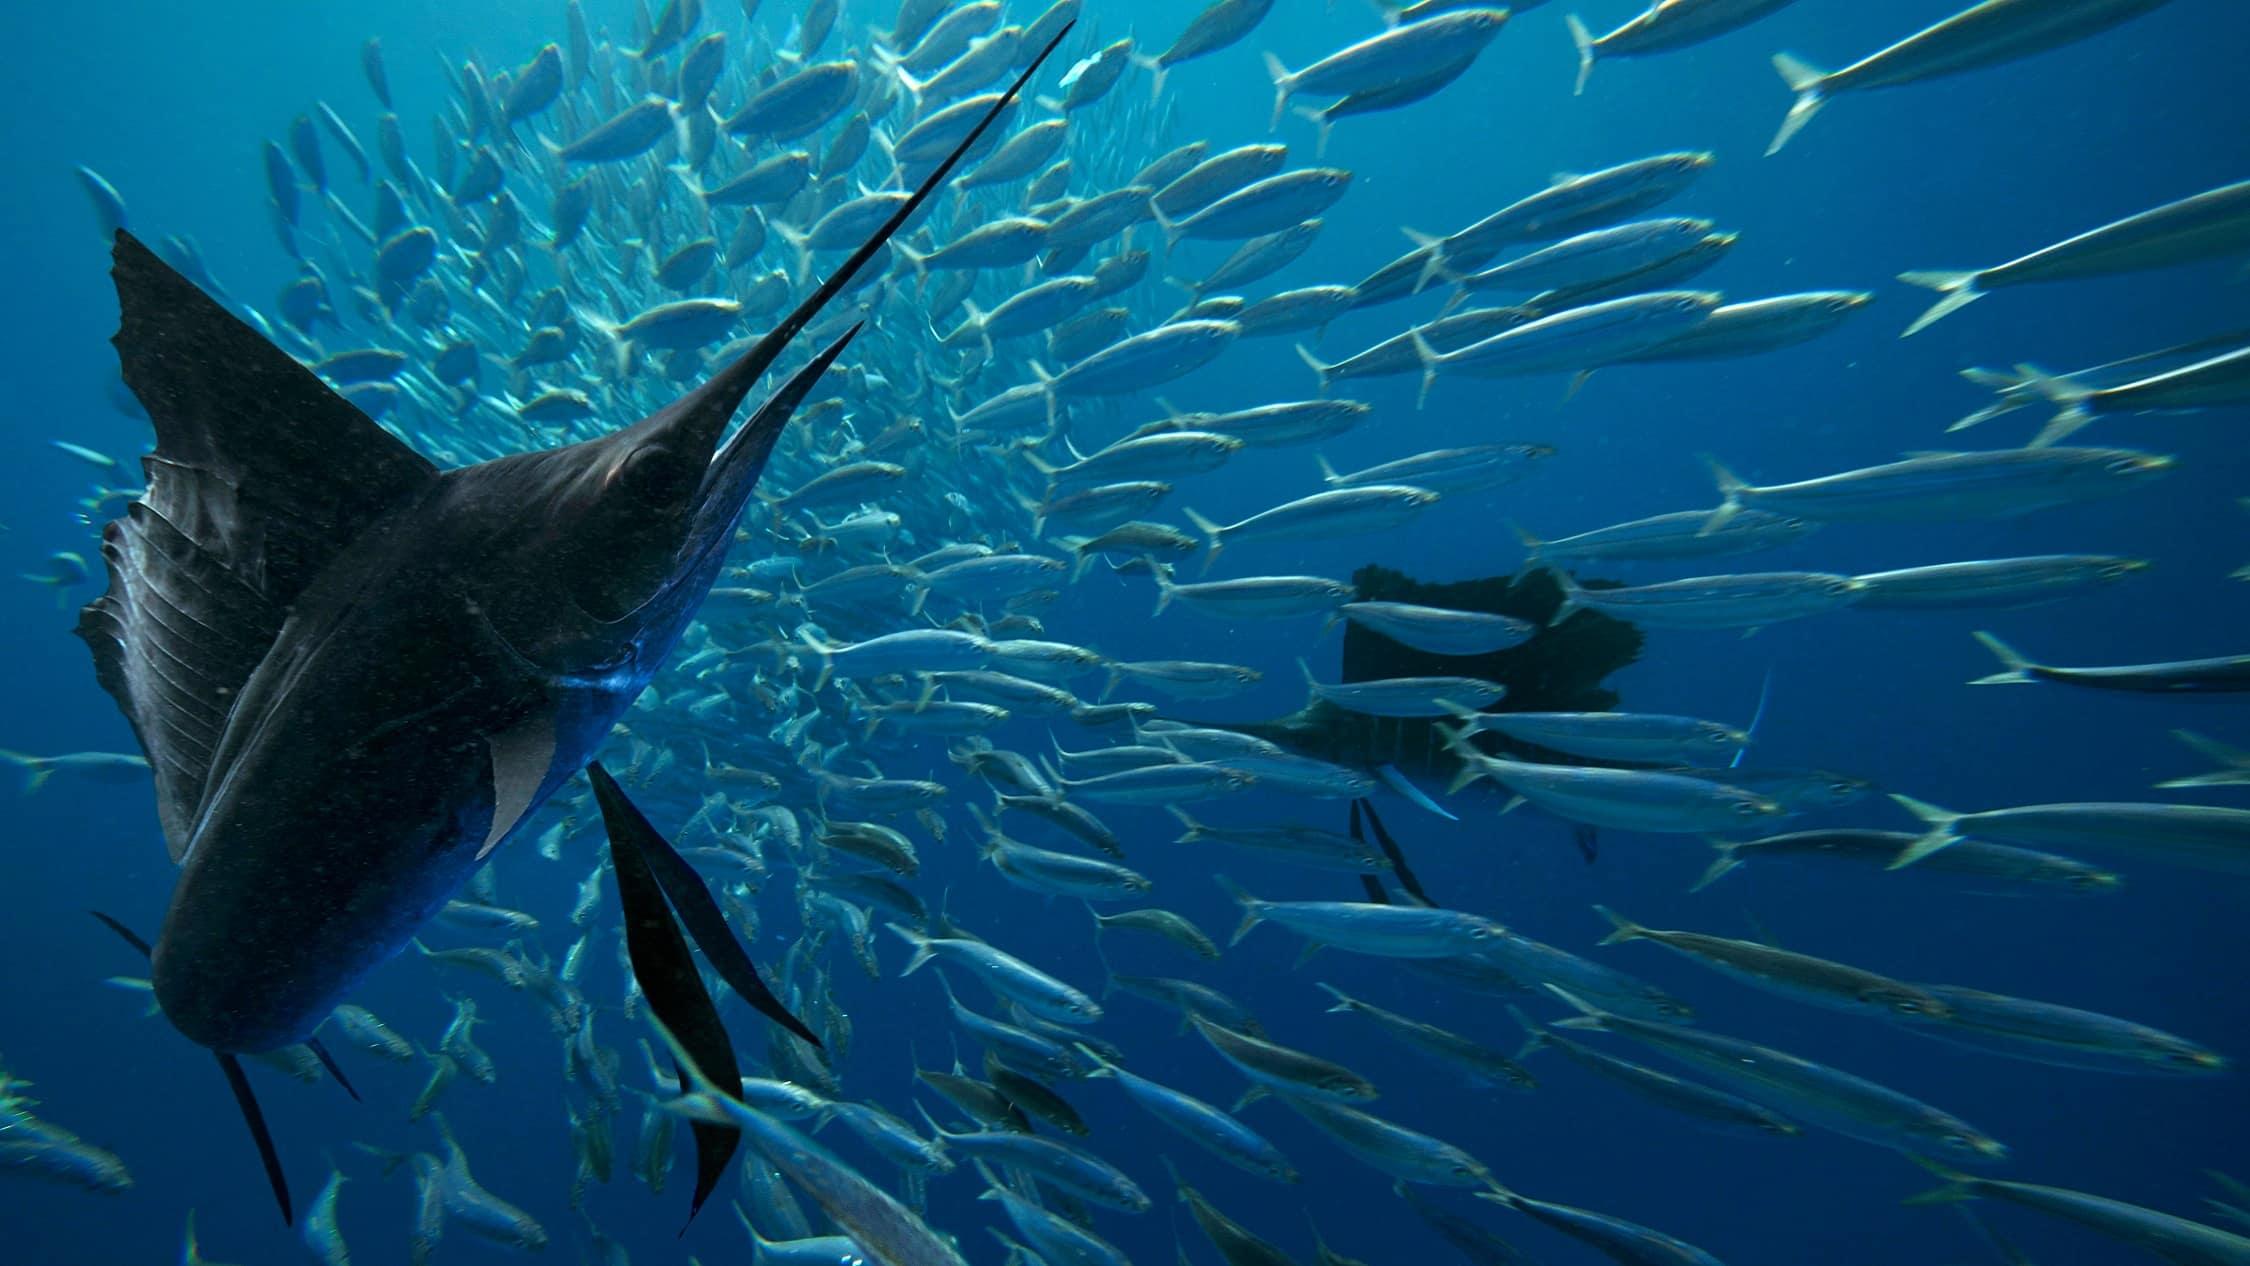 poissons-marlin-cover-costa-rica-decouverte